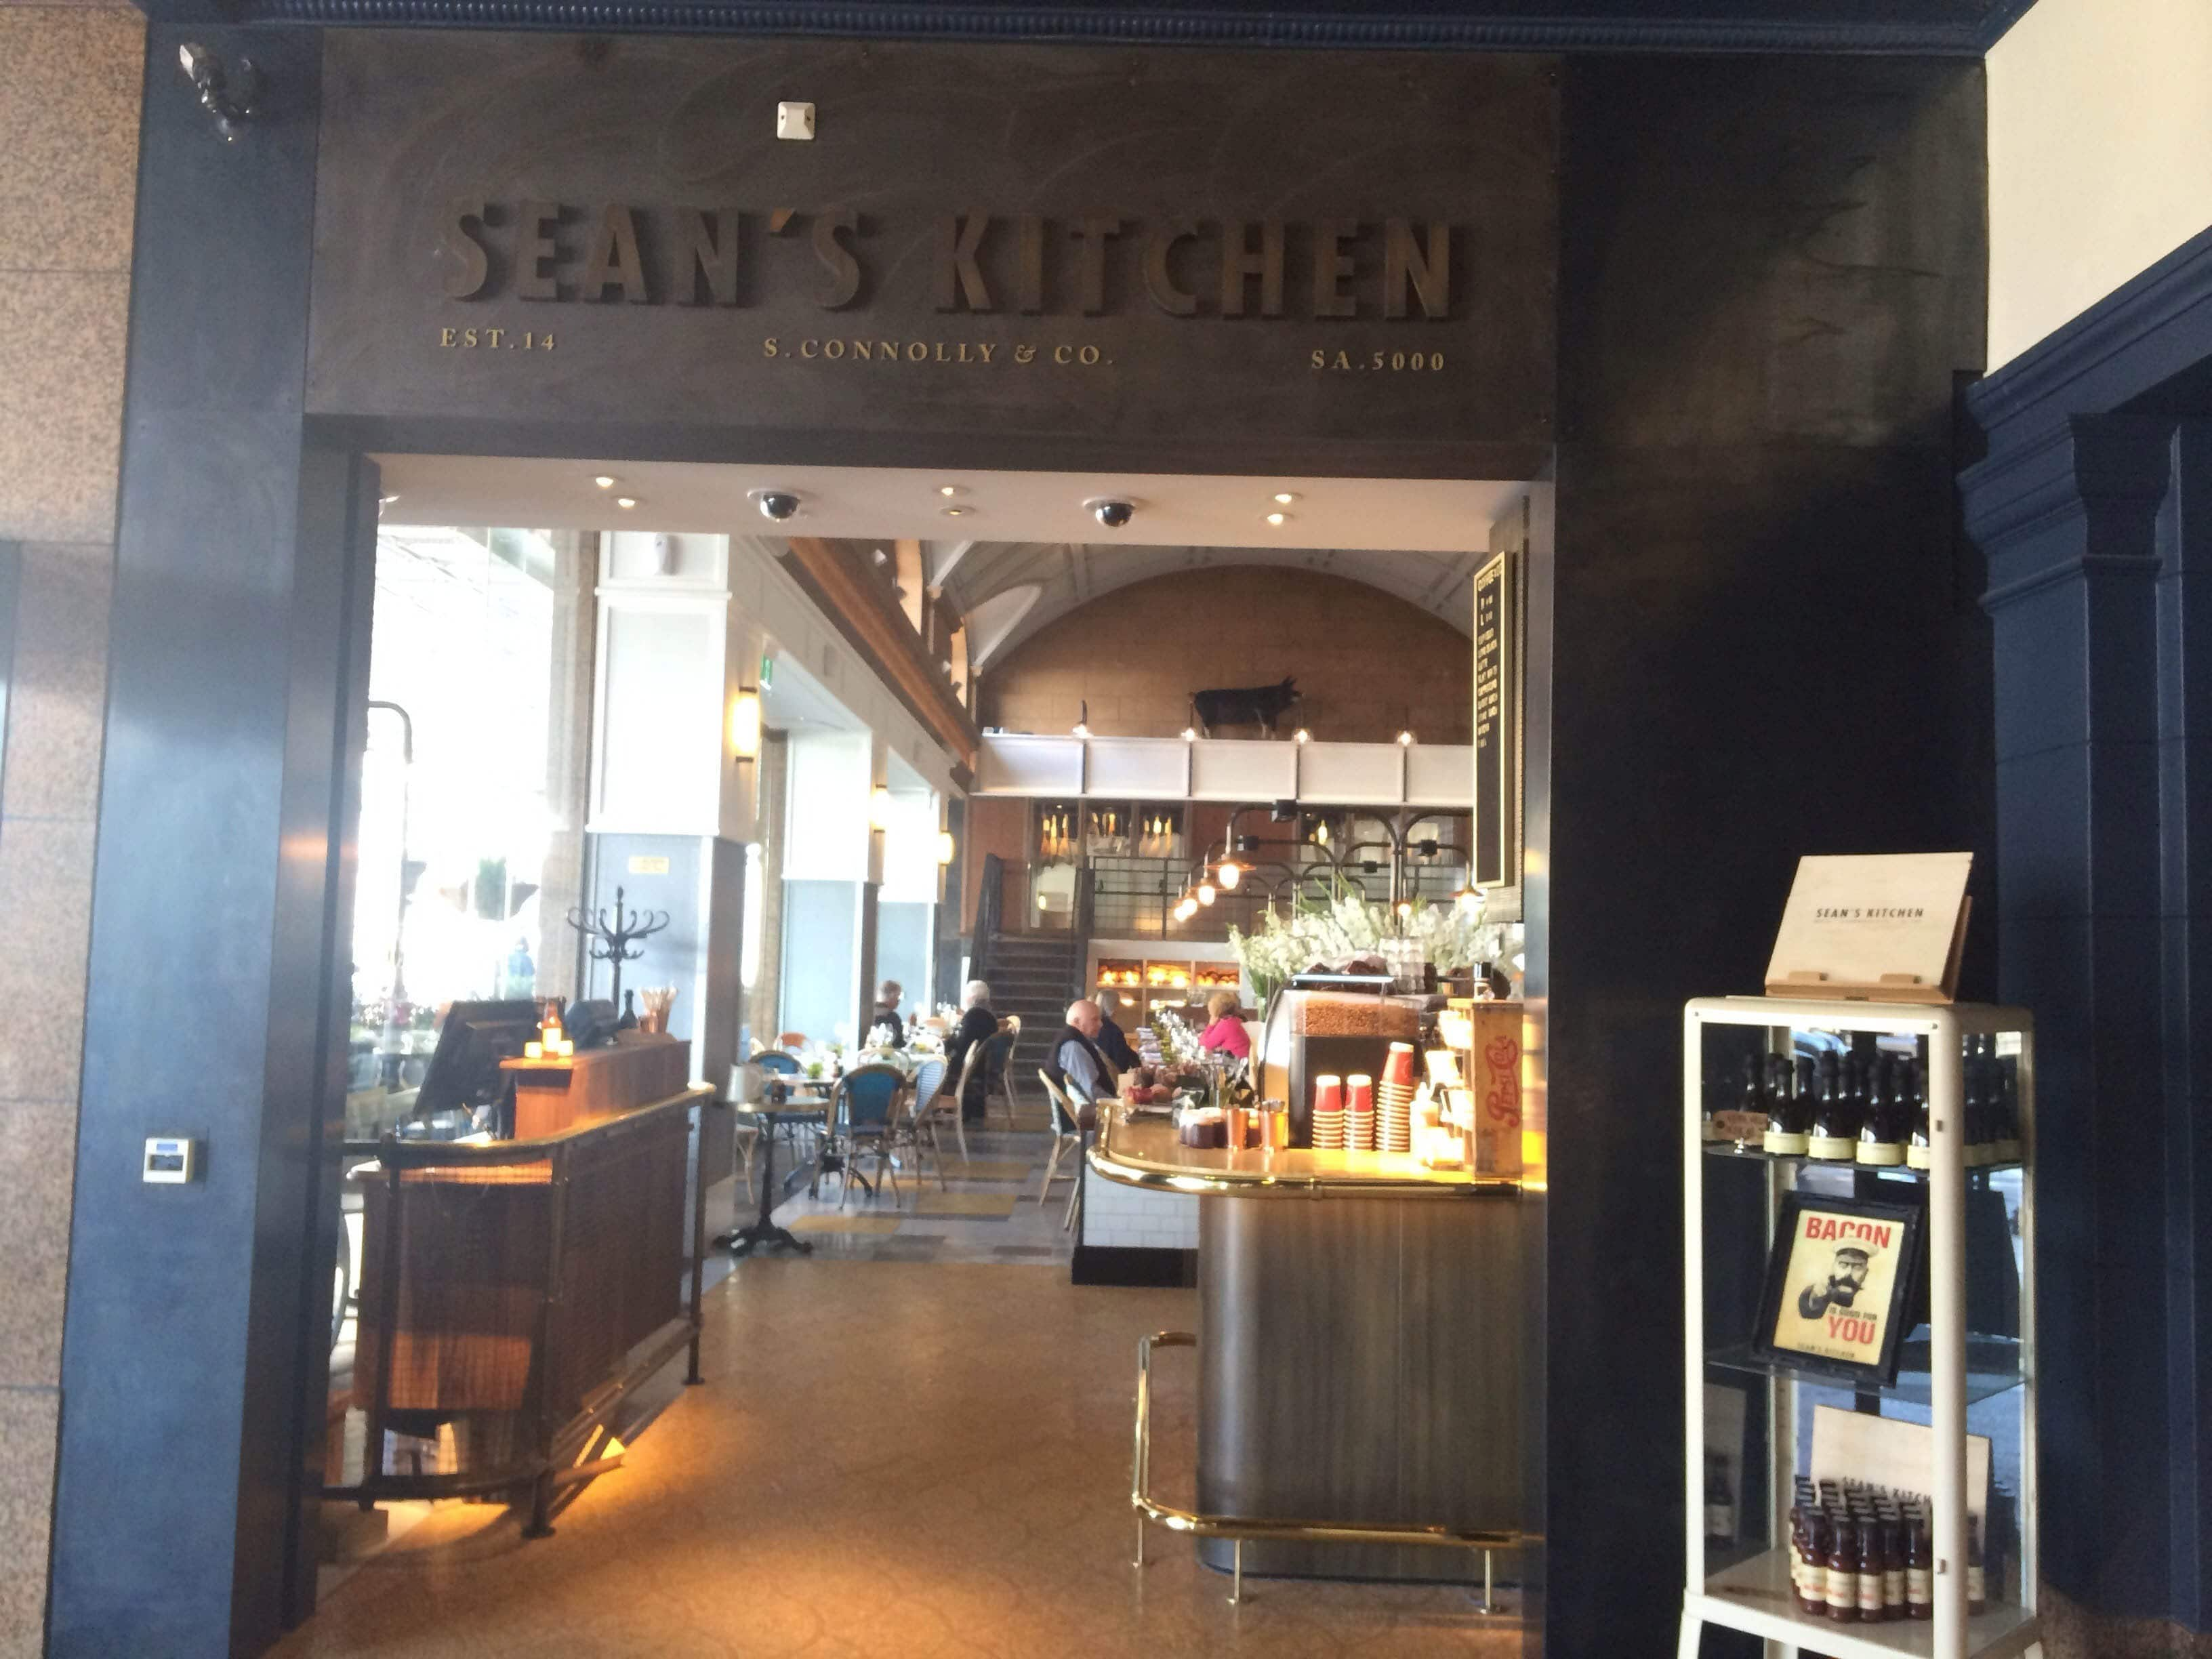 Seans kitchen star city casino casino grand job mgm